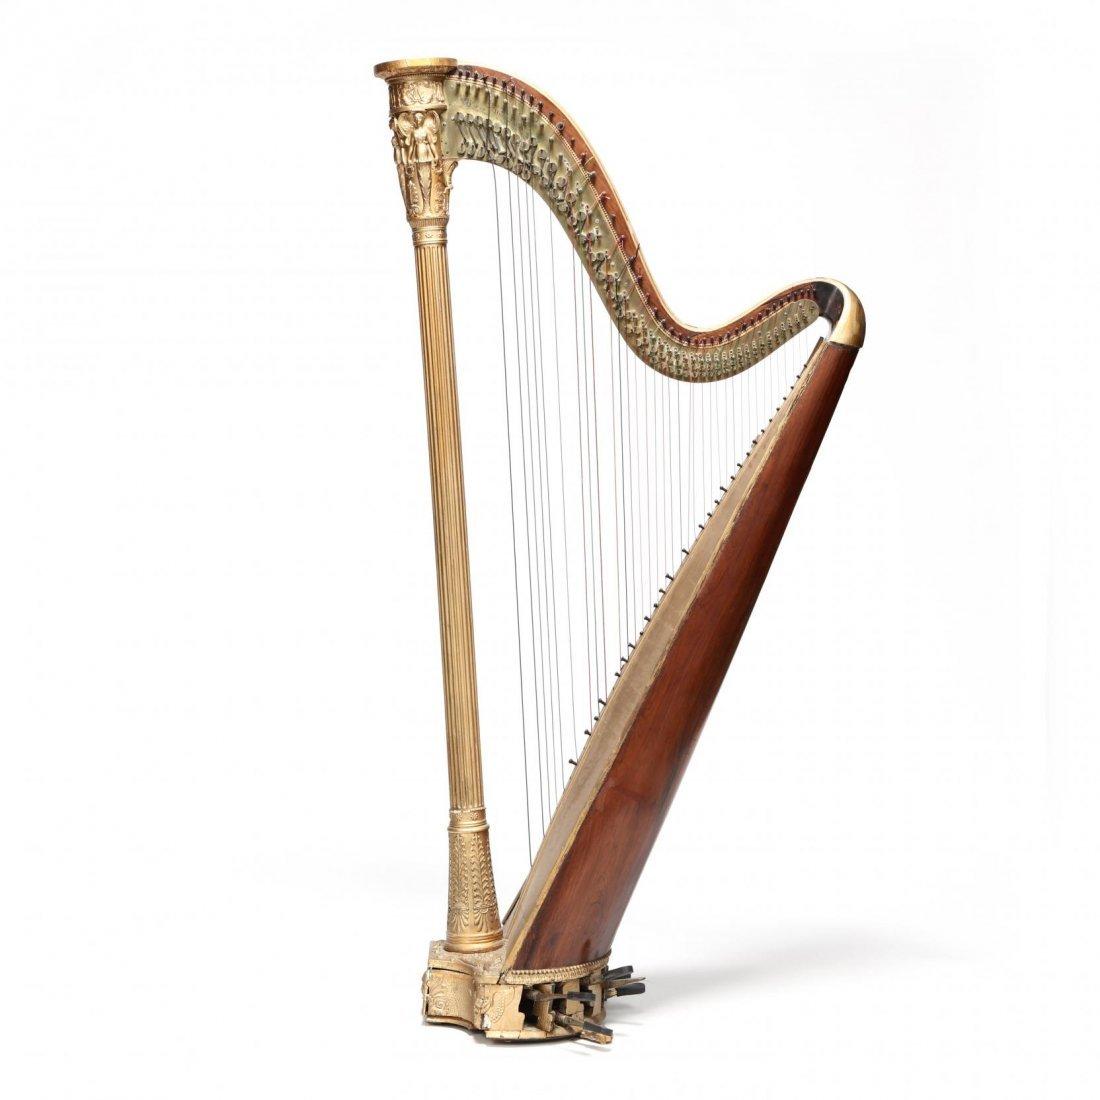 Regency Parcel Gilt Harp by Sebastian Erard - 9